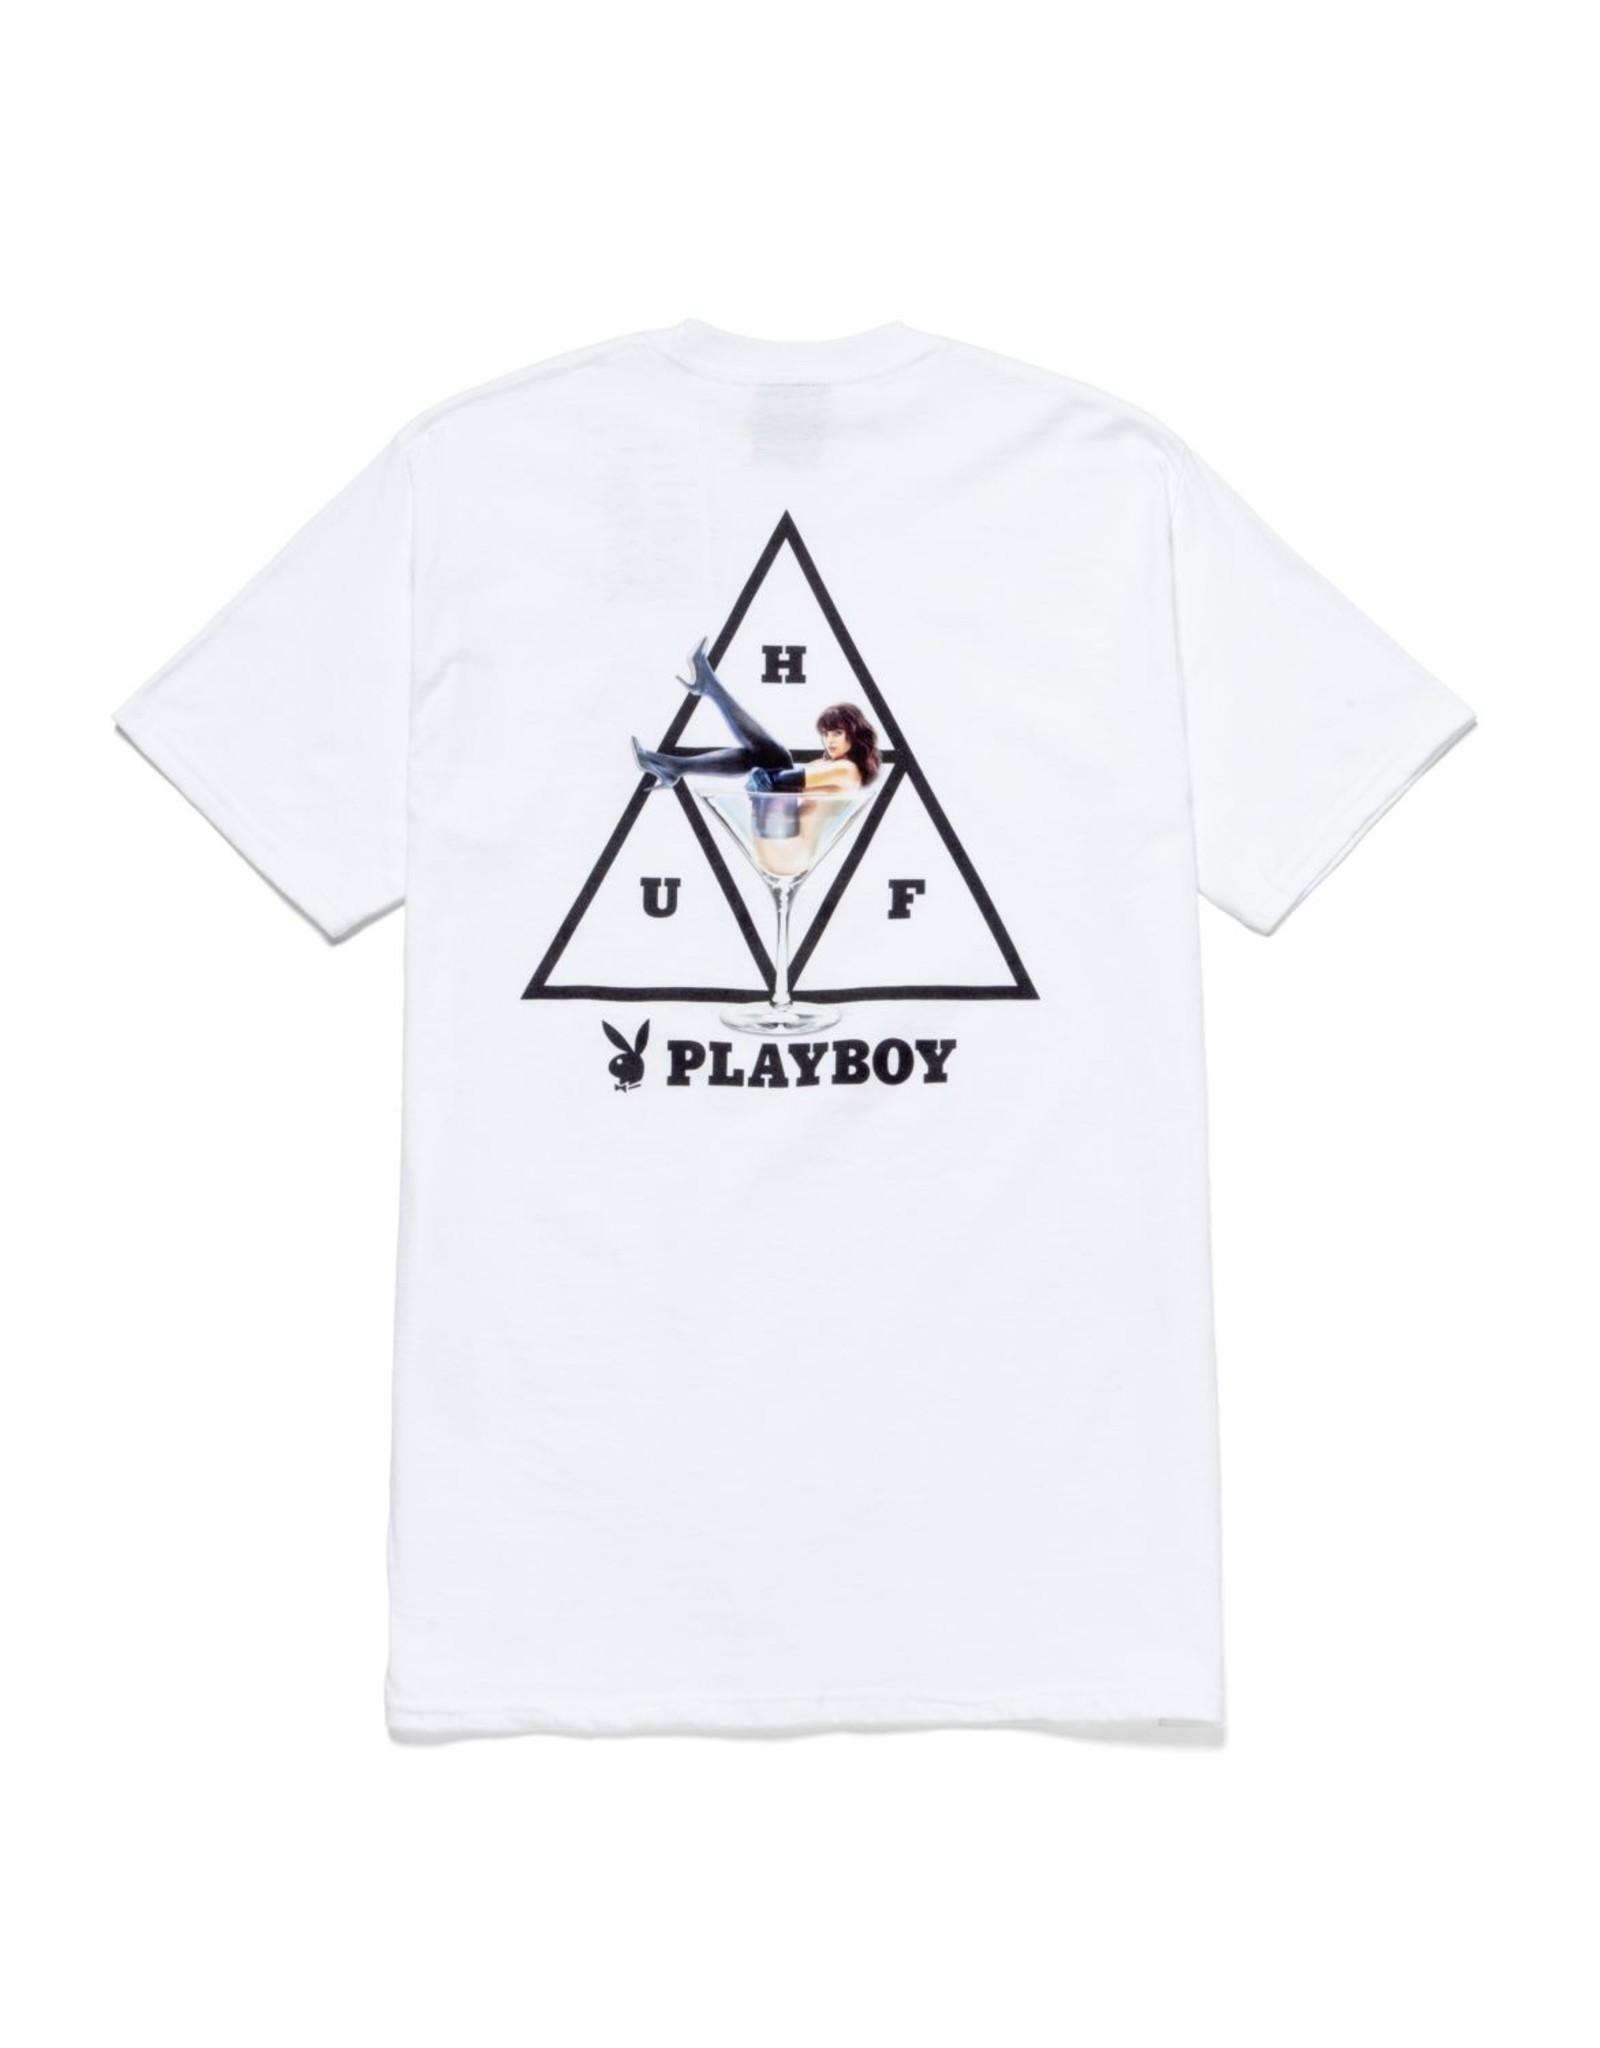 White playboy playmate